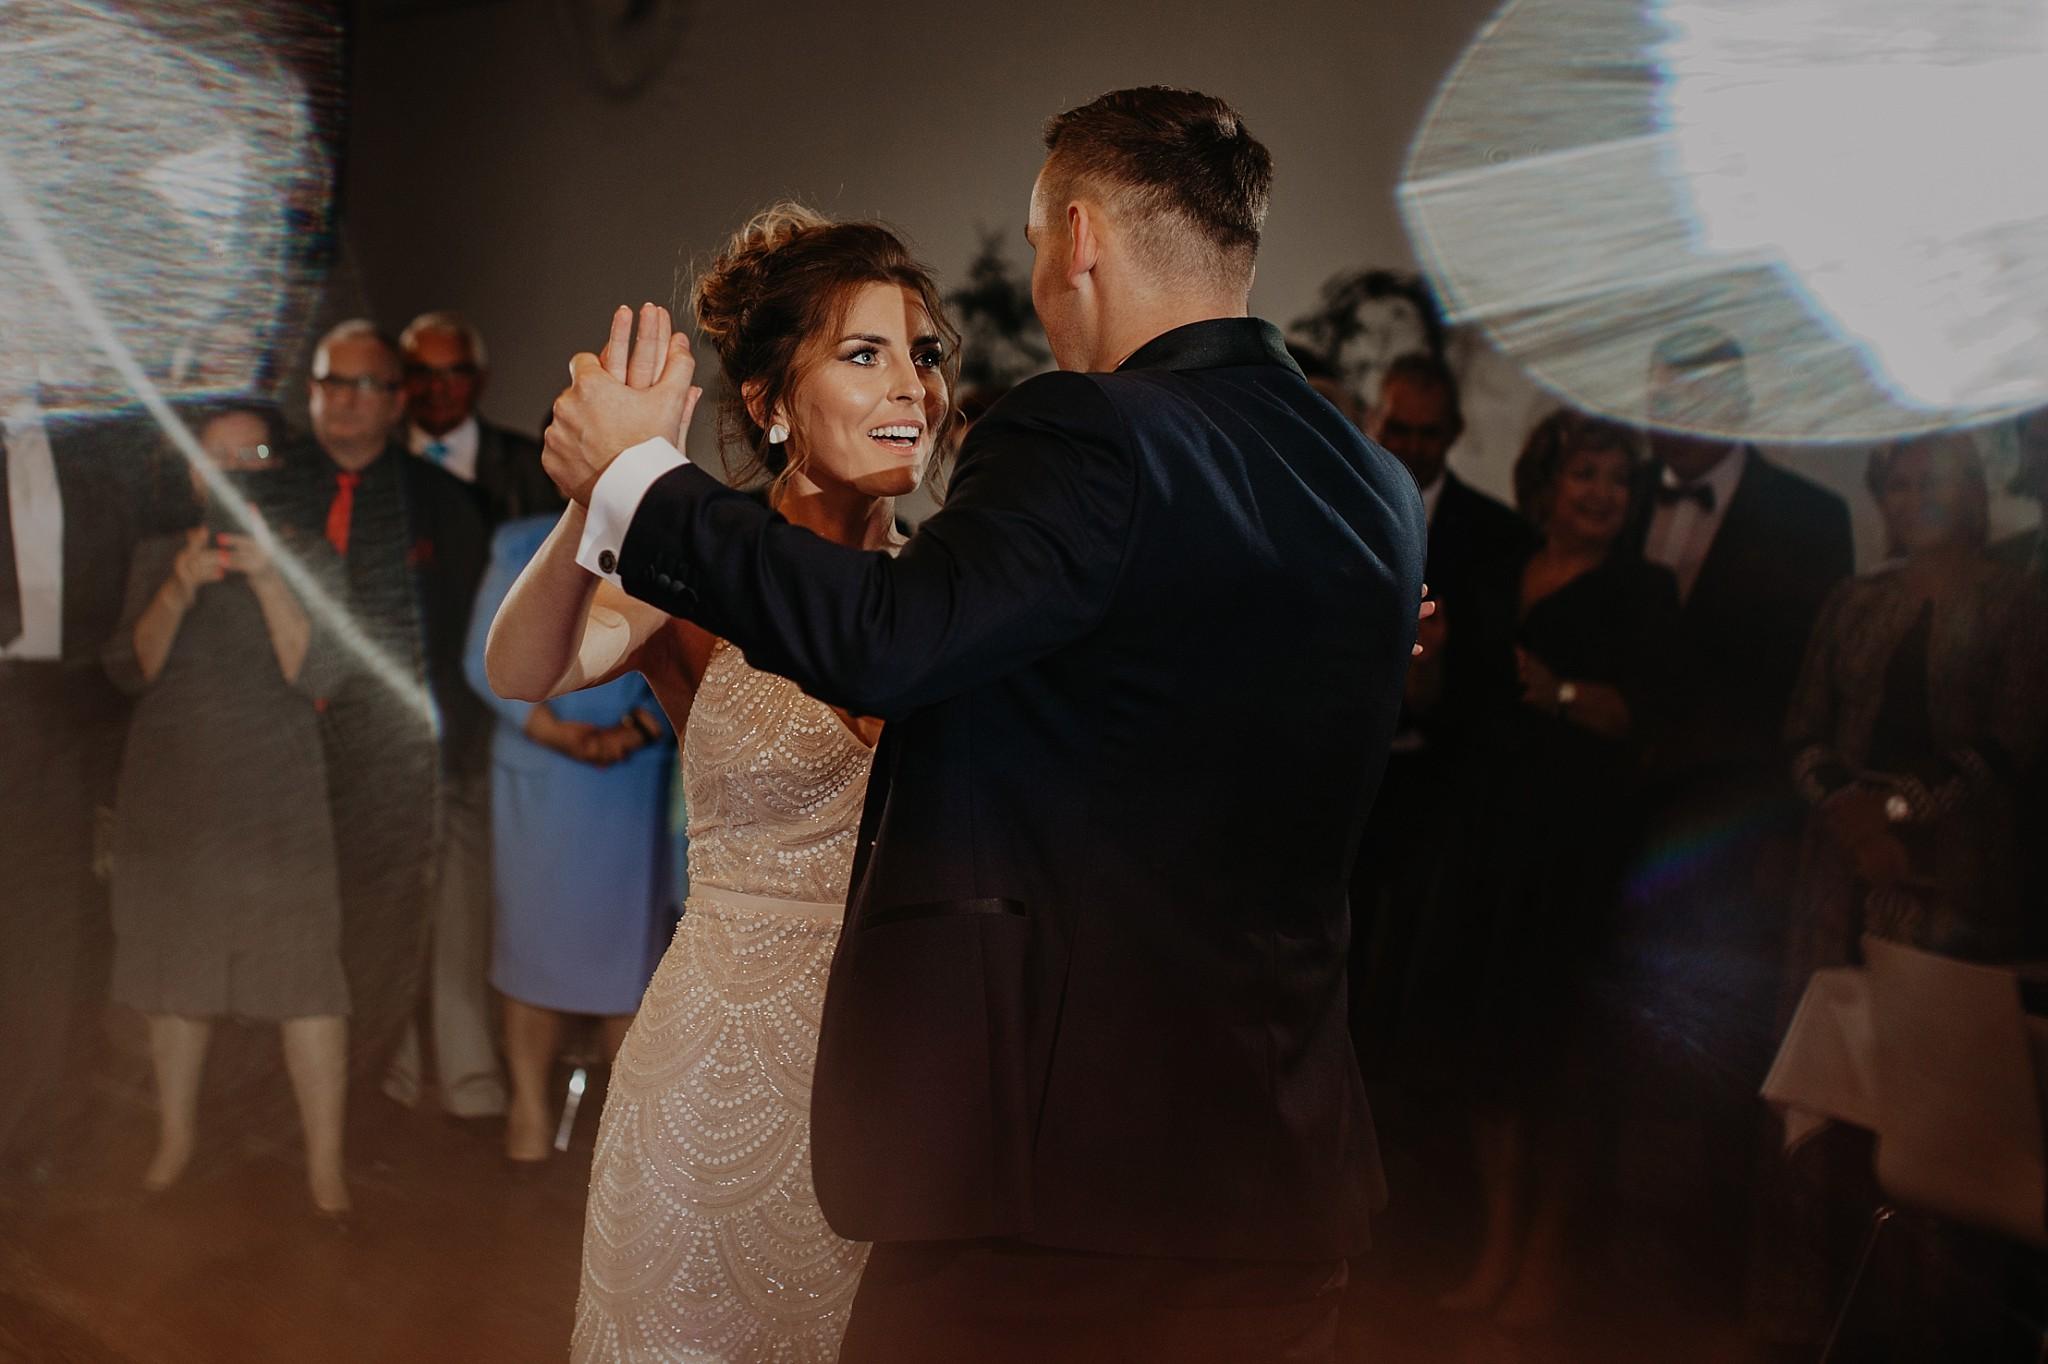 fotograf poznan wesele dobra truskawka piekne wesele pod poznaniem wesele w dobrej truskawce piekna para mloda slub marzen slub koronawirus slub listopad wesele koronawirus 309